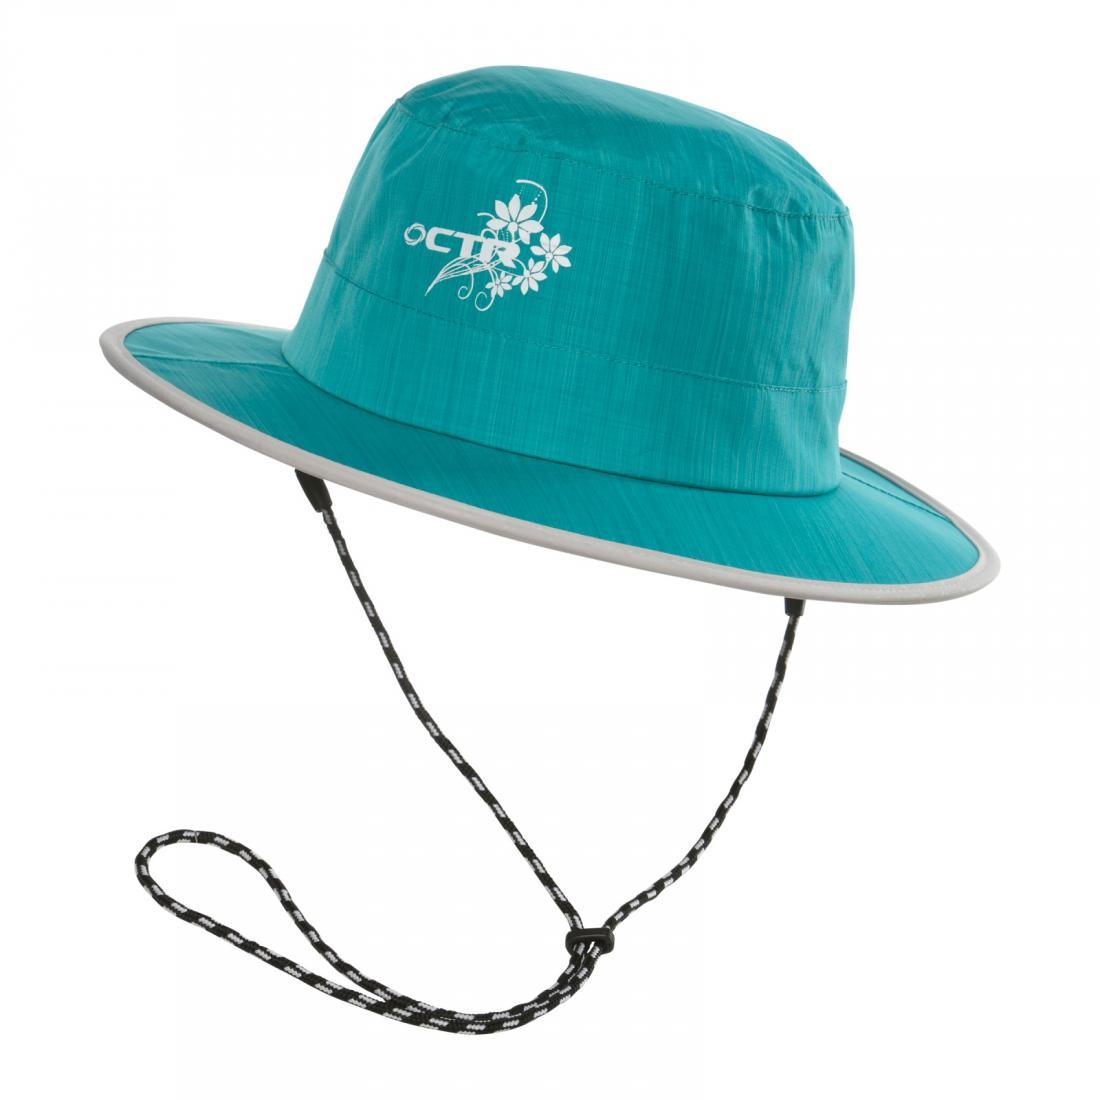 Панама Chaos  Stratus Bucket Hat (женс)Панамы<br><br><br>Цвет: Голубой<br>Размер: S-M